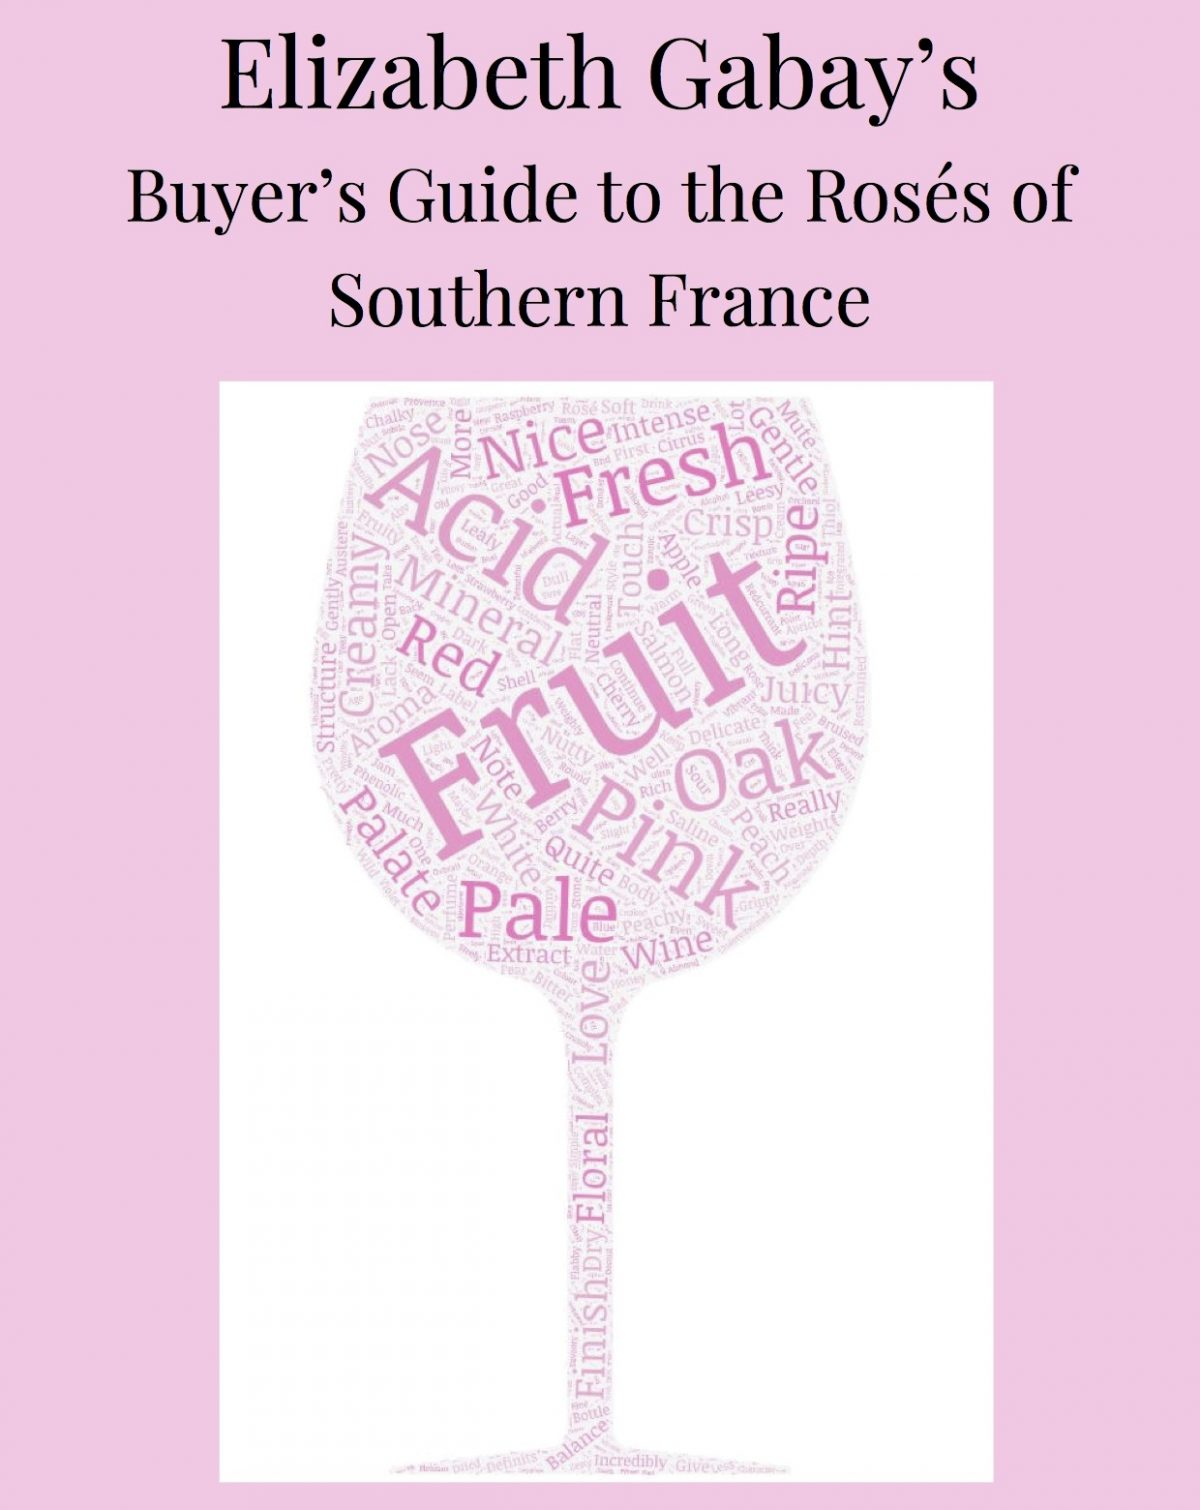 Buyer's Guide to the Roses of Sothern France – Elizabeth Gabay